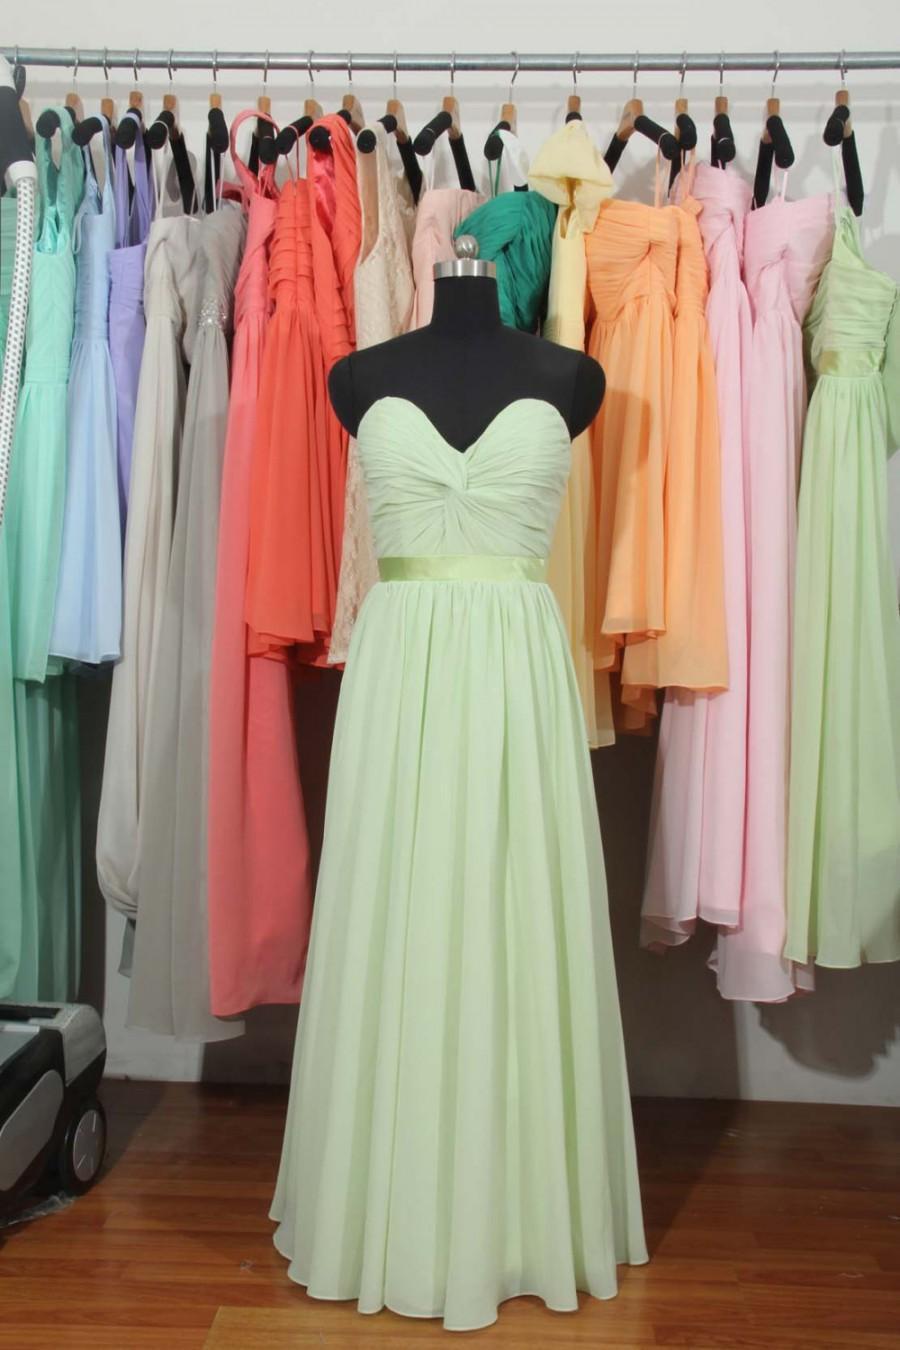 Wedding - Jennifer Lopez Pink Formal Evening Dress in Film 'Maid In Manhattan' Celebrity Dresses